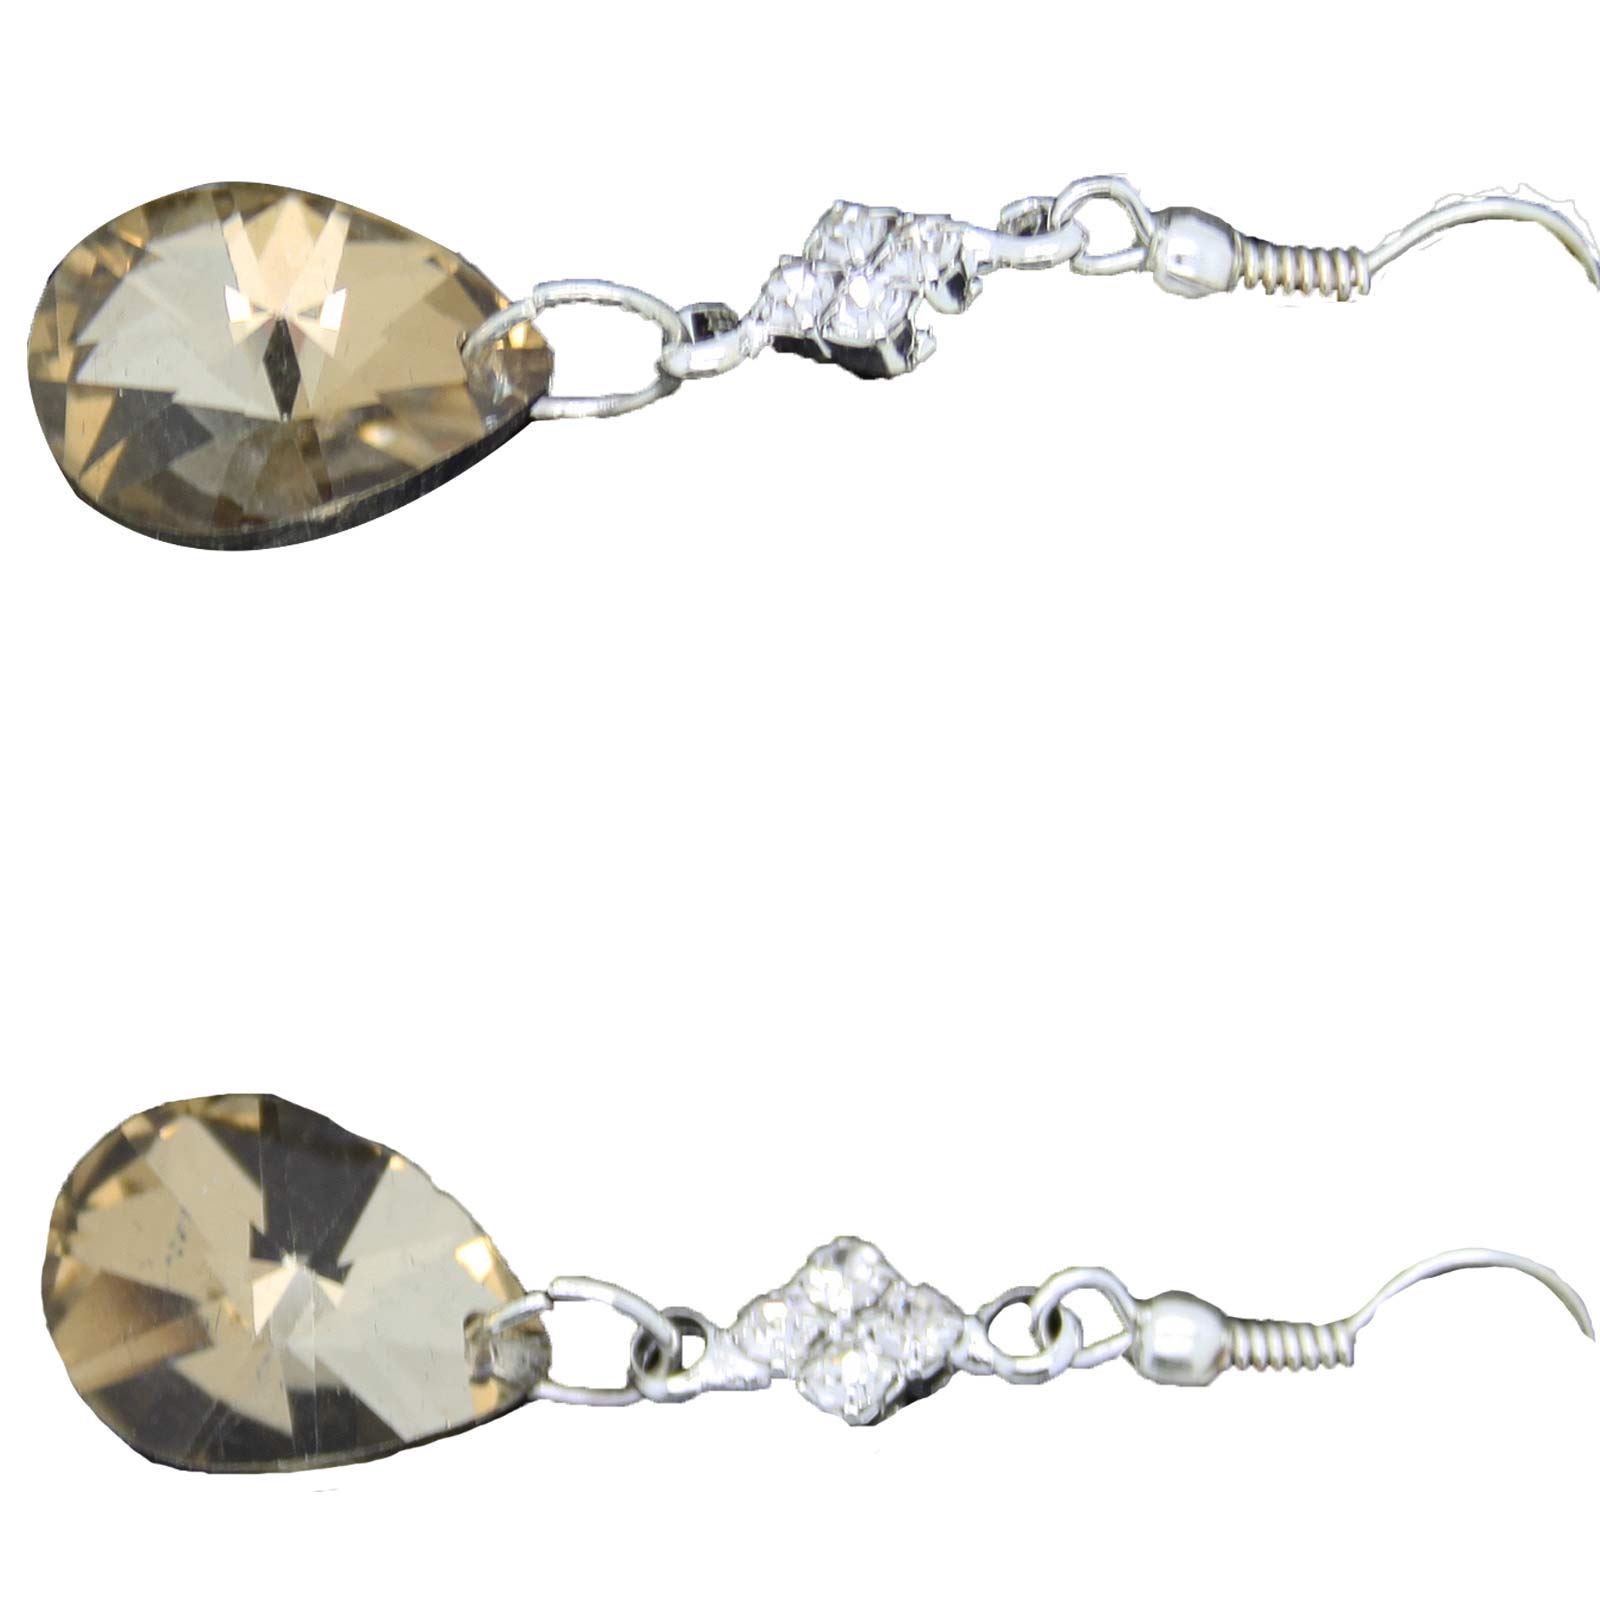 True-Face-Ladies-Women-039-s-Elegant-Earrings-Necklace-Set-Metal-Alloy-Jewellery thumbnail 41